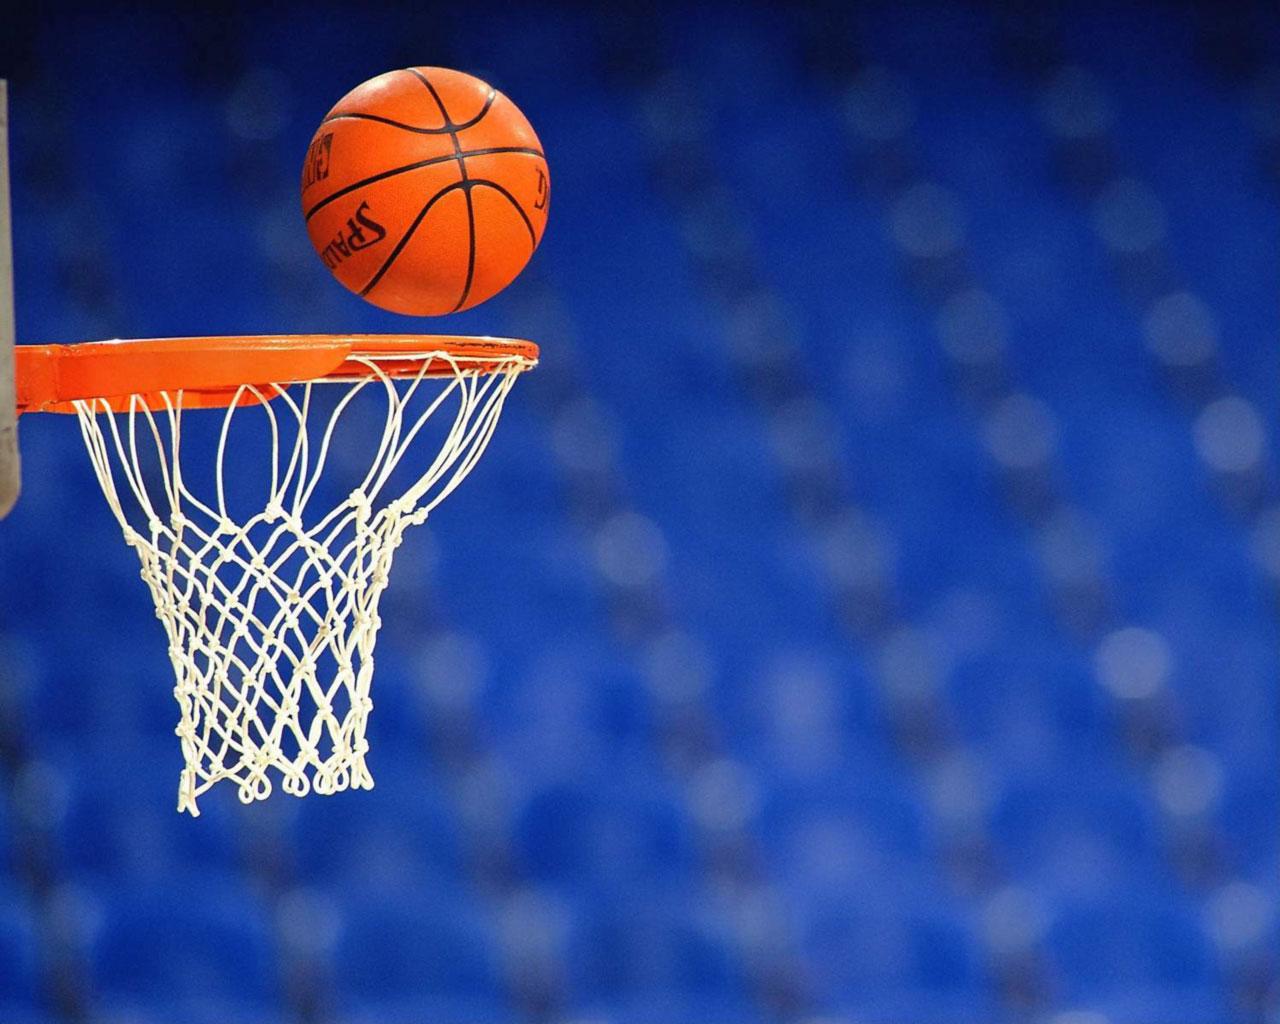 Basketball HD Wallpapers | Nice Wallpapers